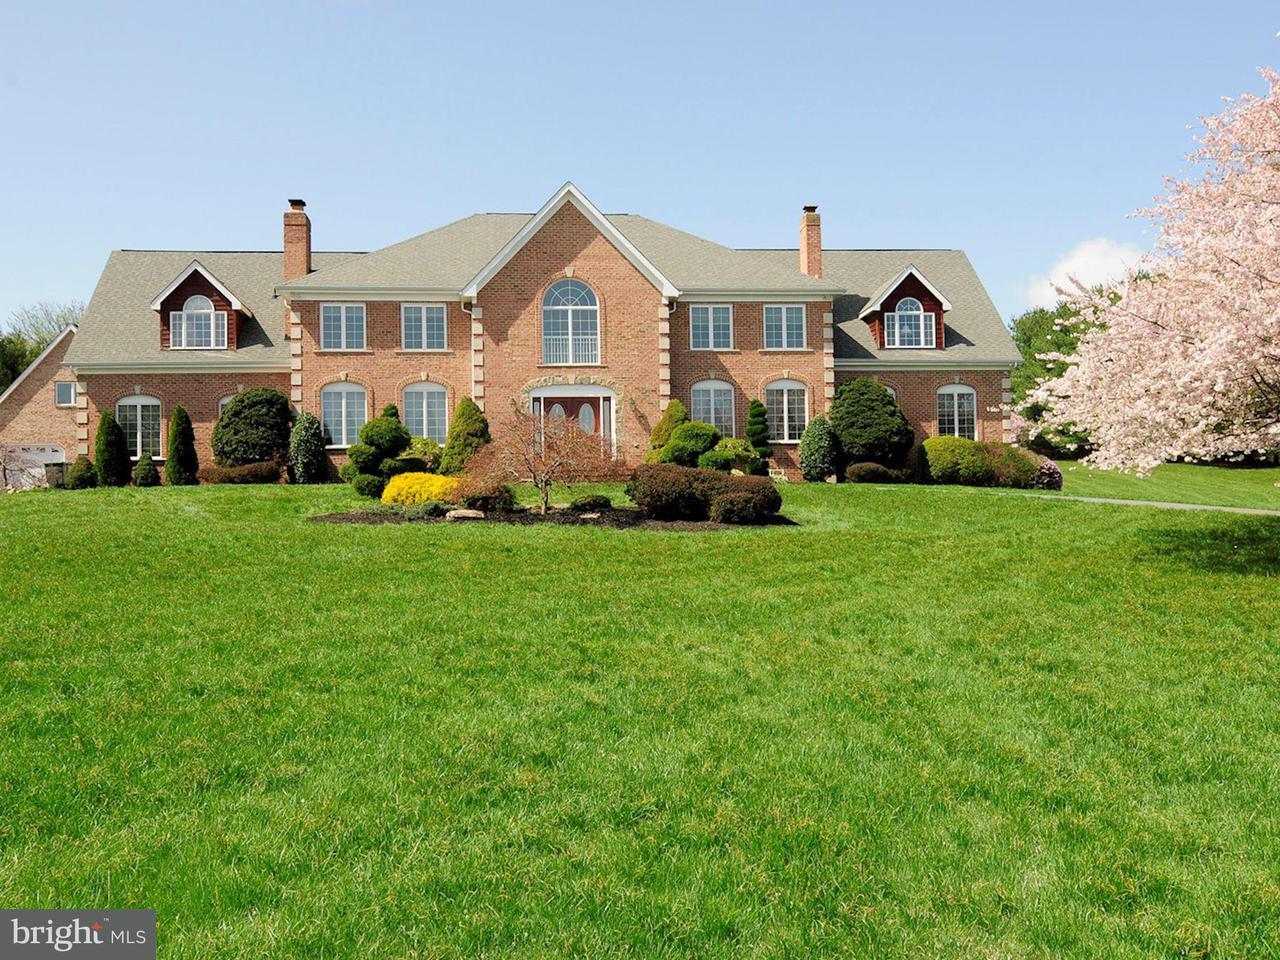 Casa Unifamiliar por un Venta en 5919 CLIFTON OAKS Drive 5919 CLIFTON OAKS Drive Clarksville, Maryland 21029 Estados Unidos